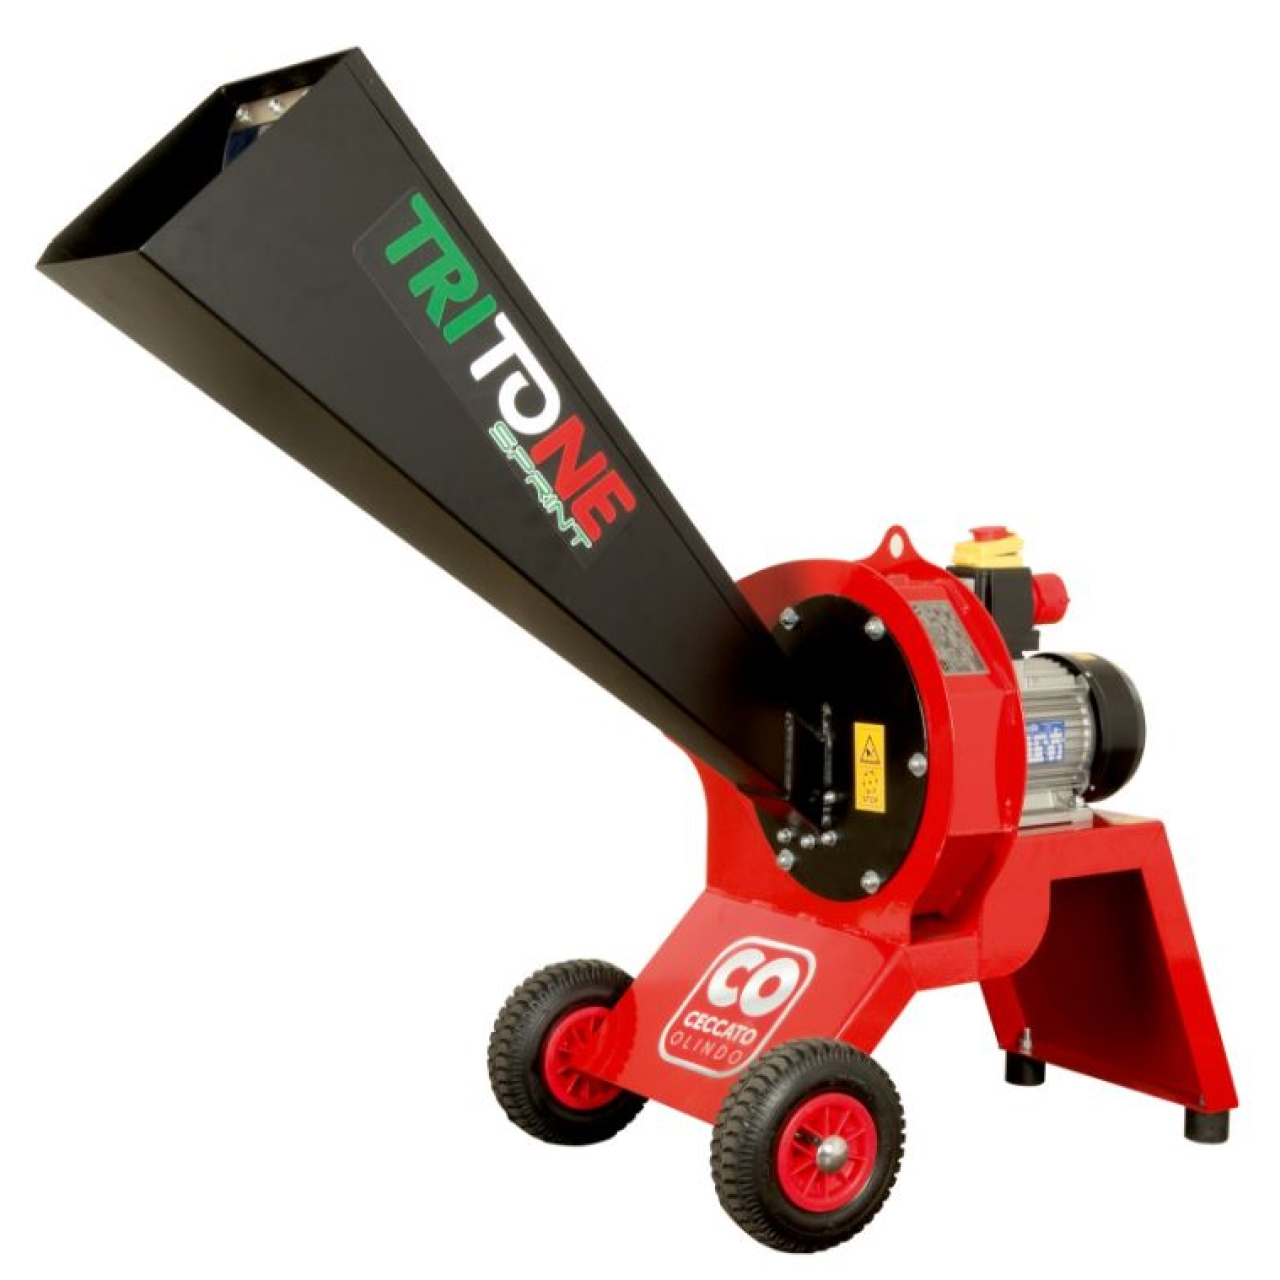 Gartenhäcksler Sprint 230 Volt